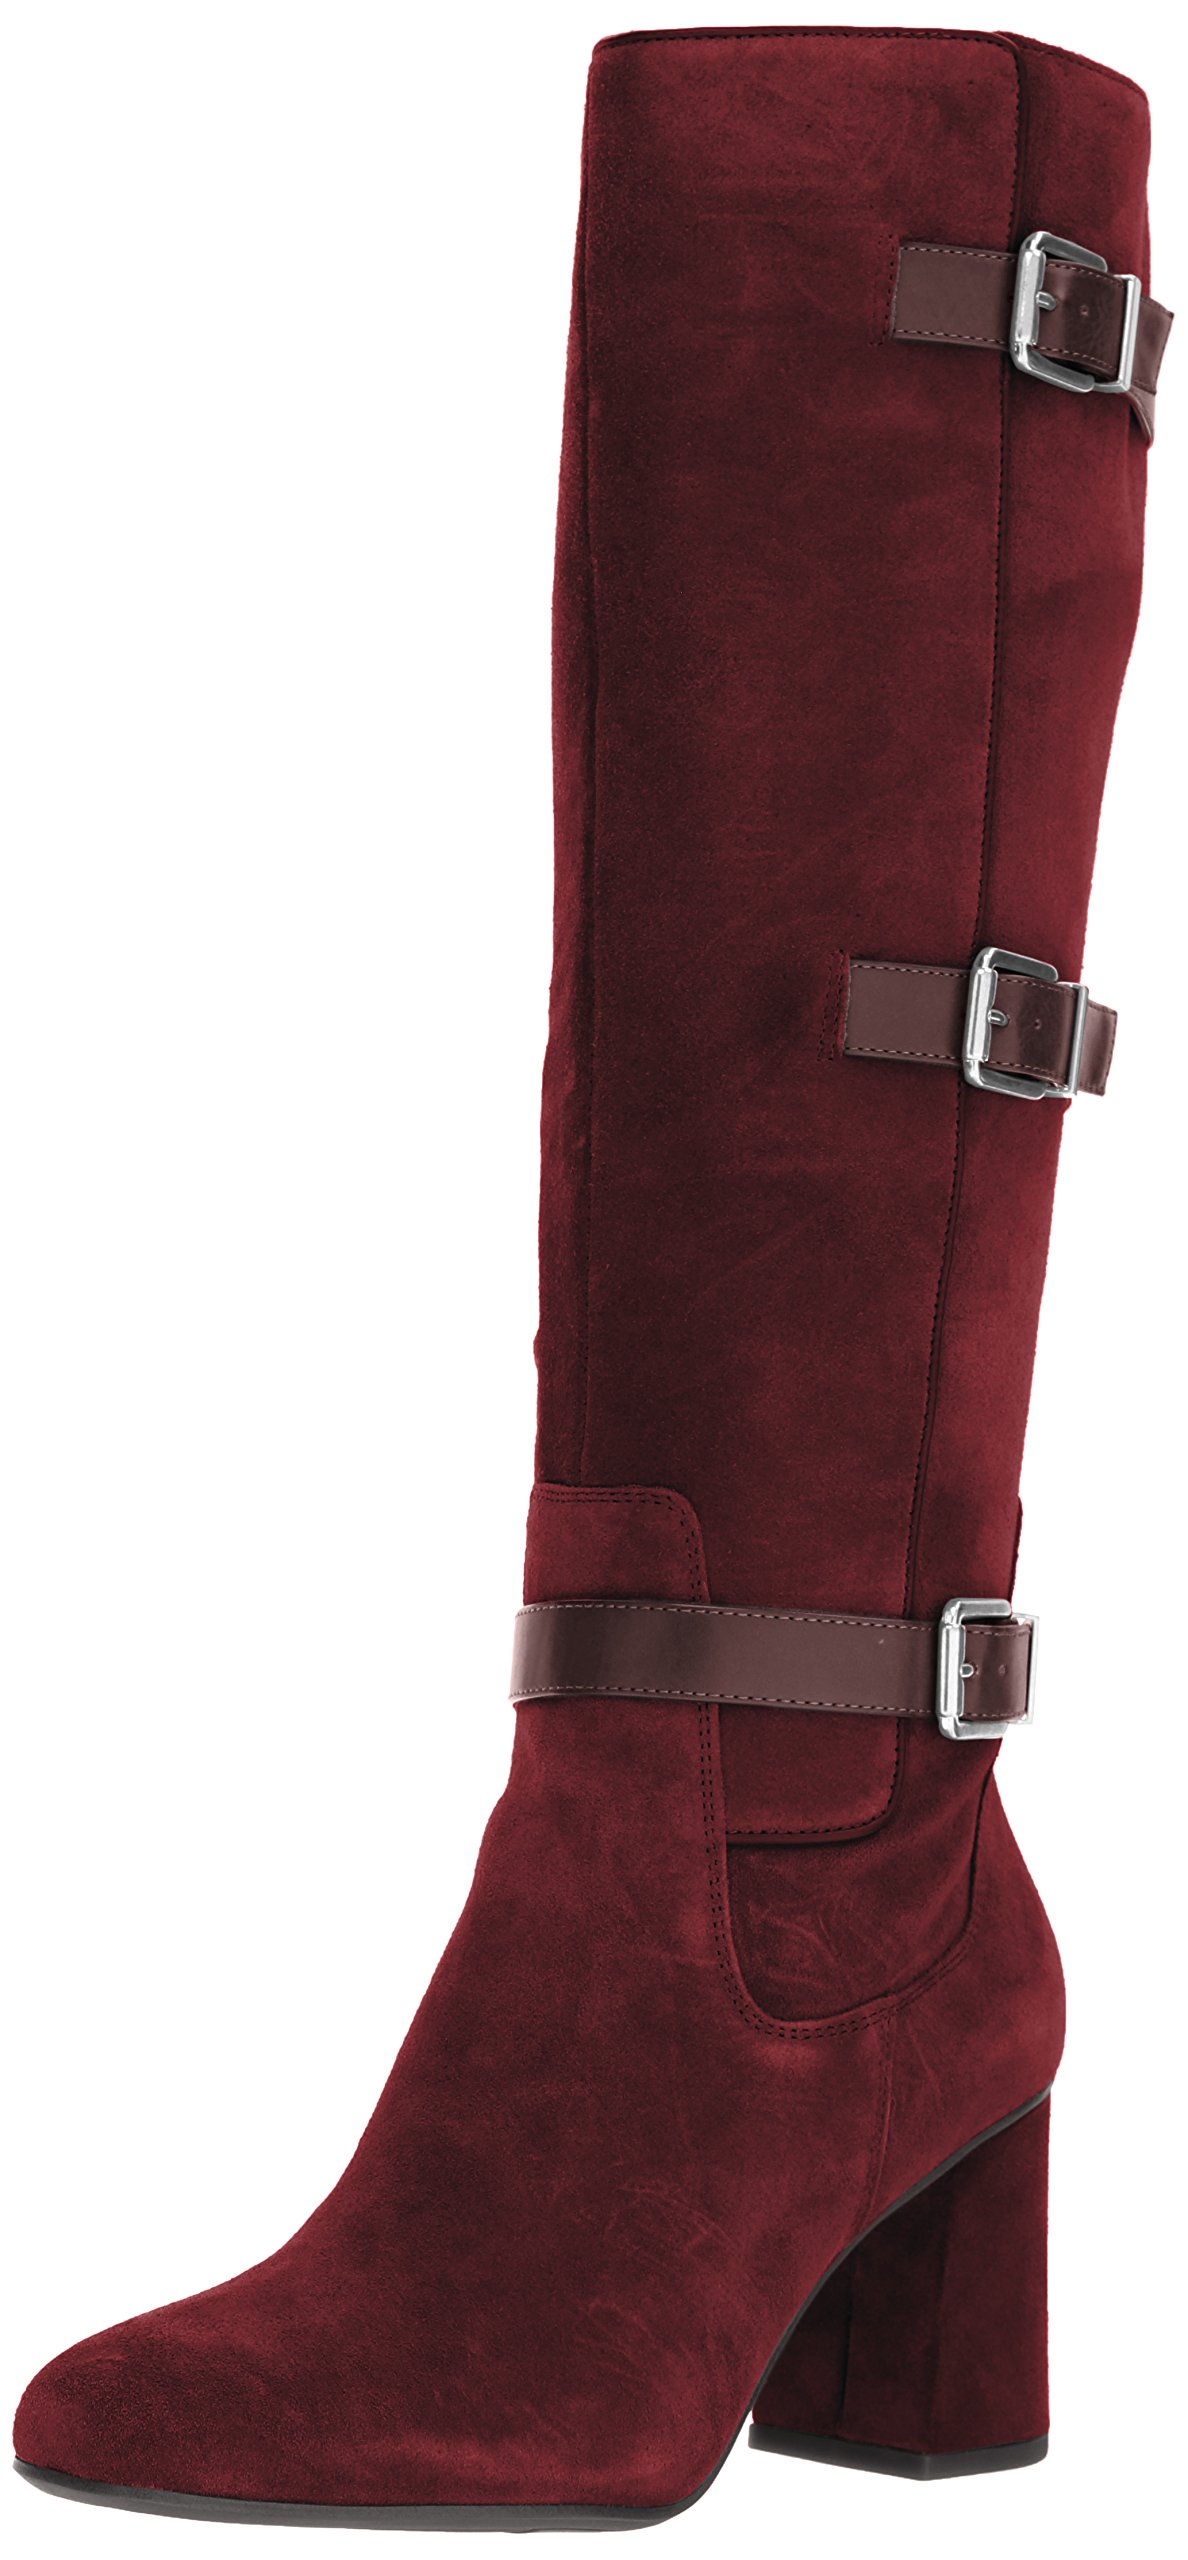 Franco Sarto Women's Knoll Knee High Boot, Augergine, 6.5 Medium US